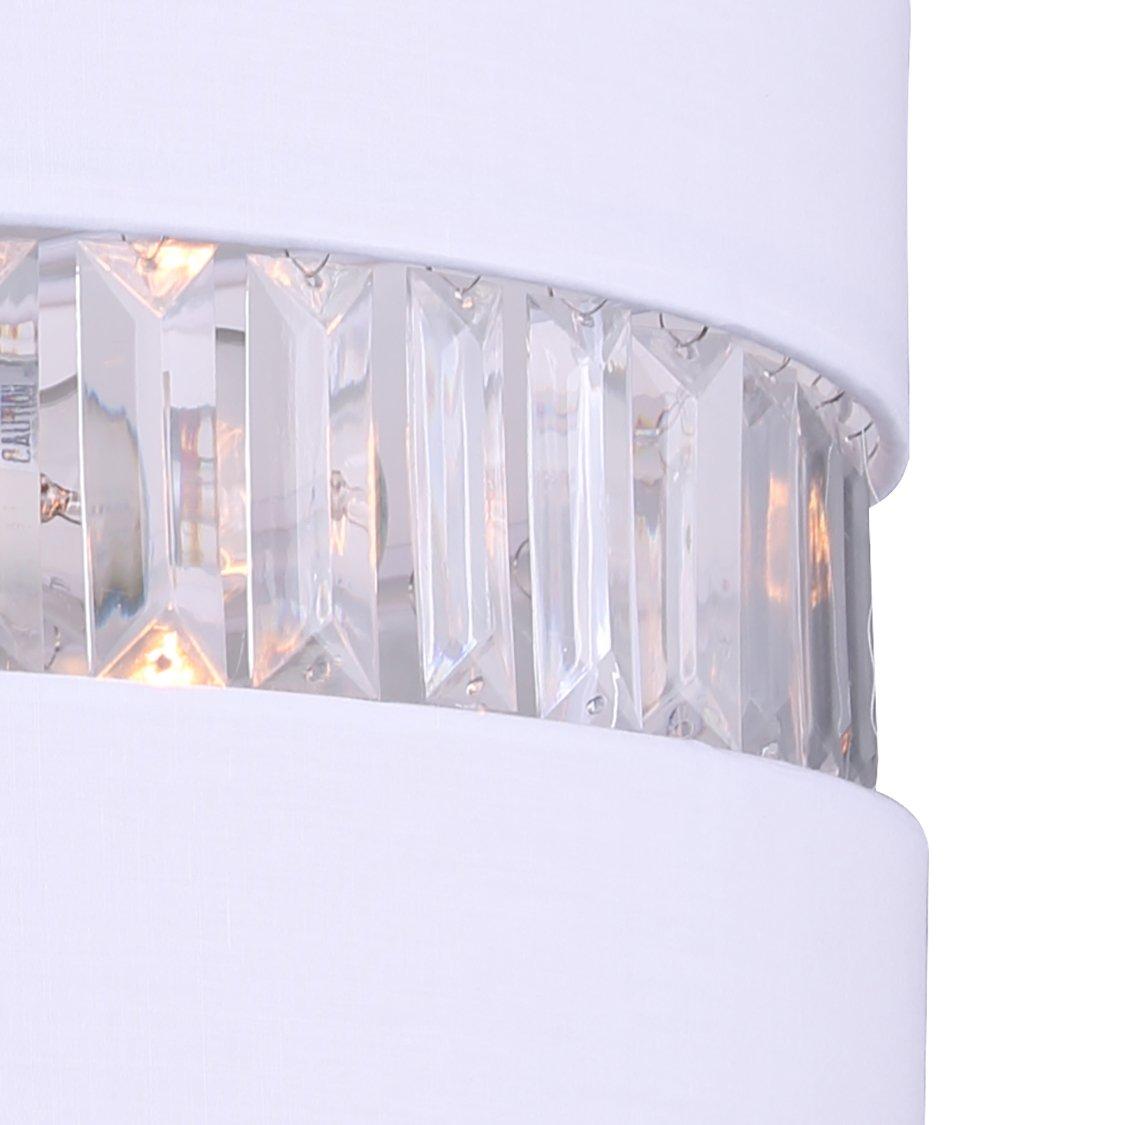 Amazon.com: Canarm ich426 a03ch16 Ballard – Lámpara de techo ...